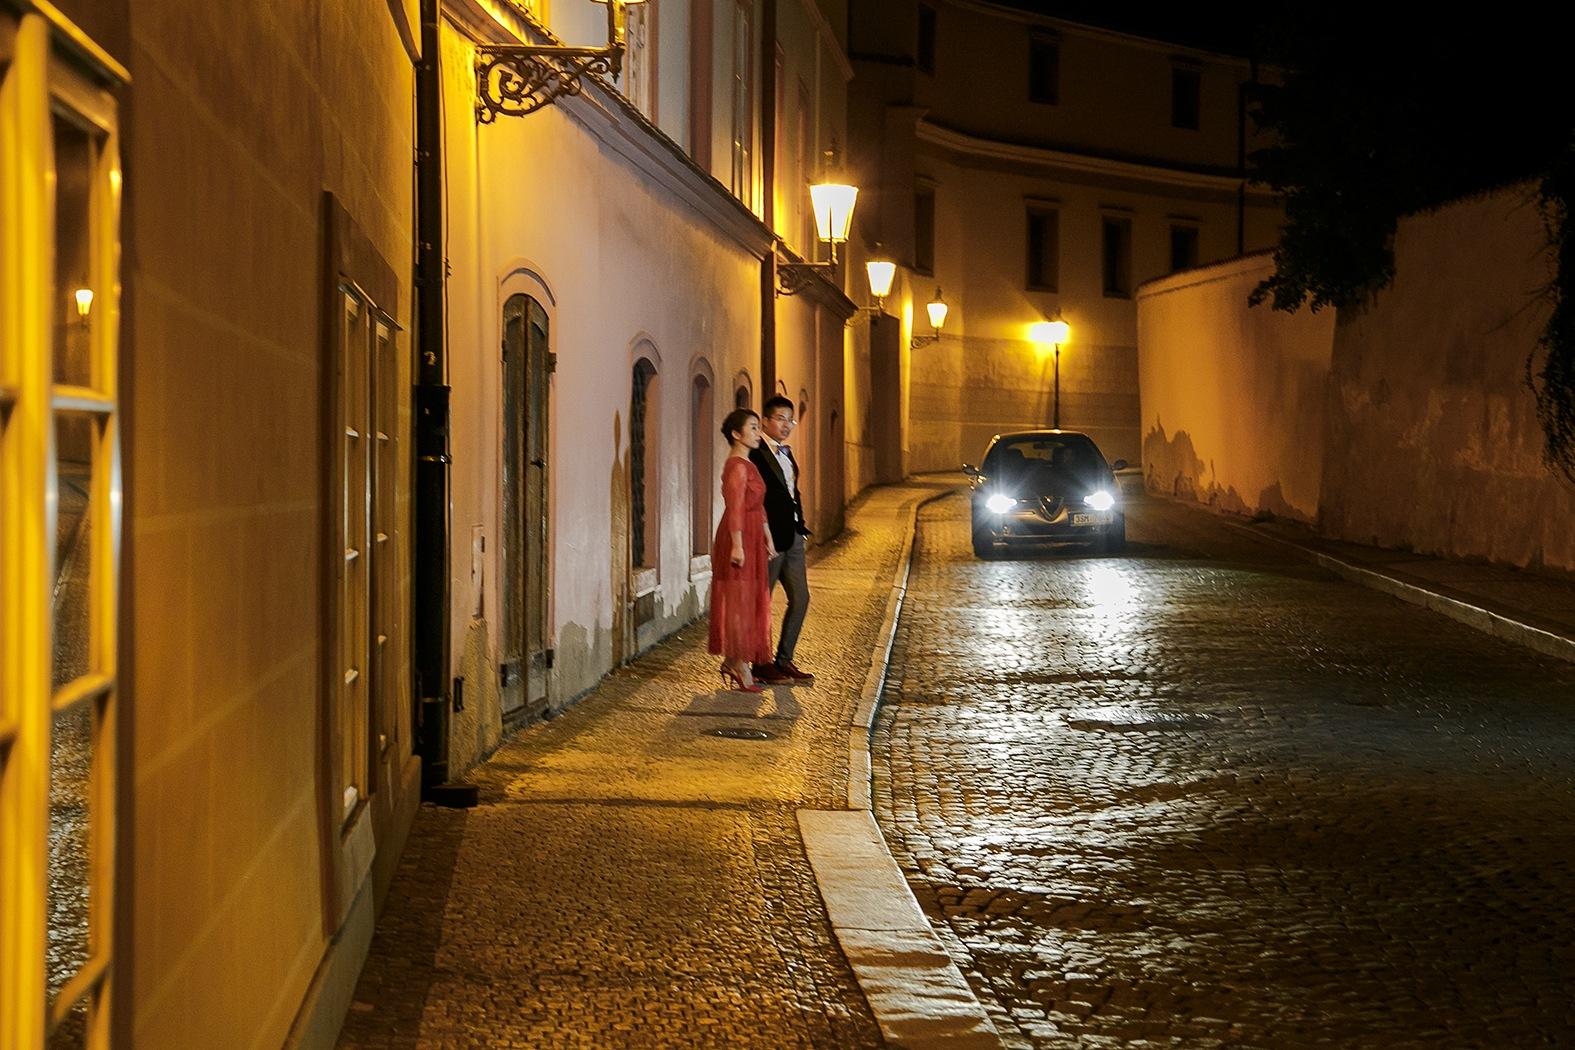 Ночное такси by Bashin Viacheslav